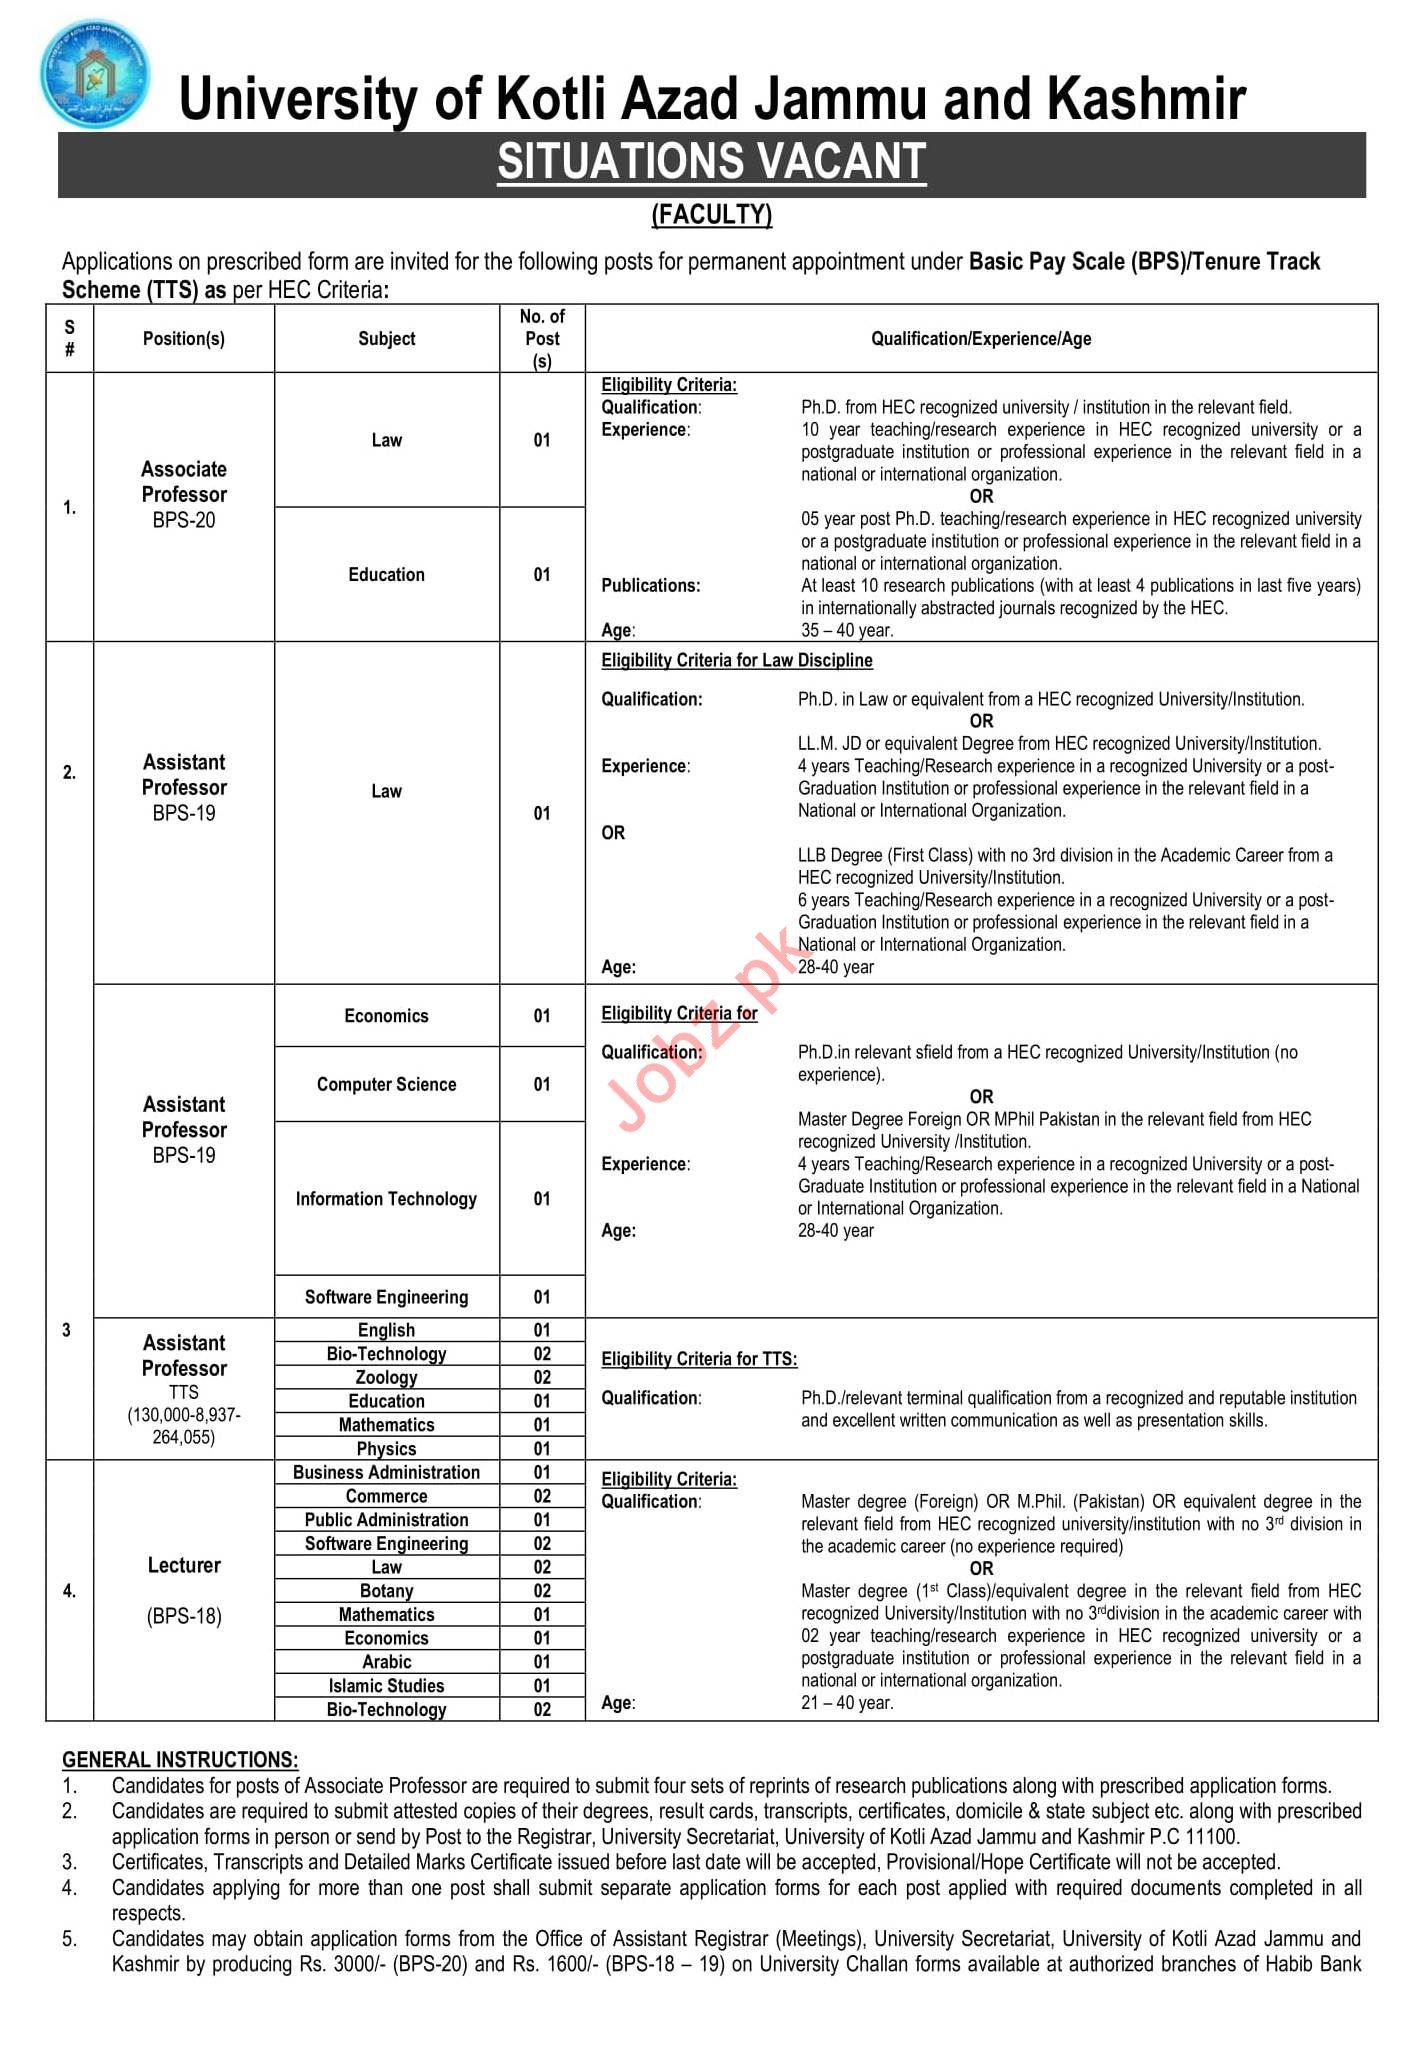 University of Kotli Azad Jammu Kashmir Jobs 2019